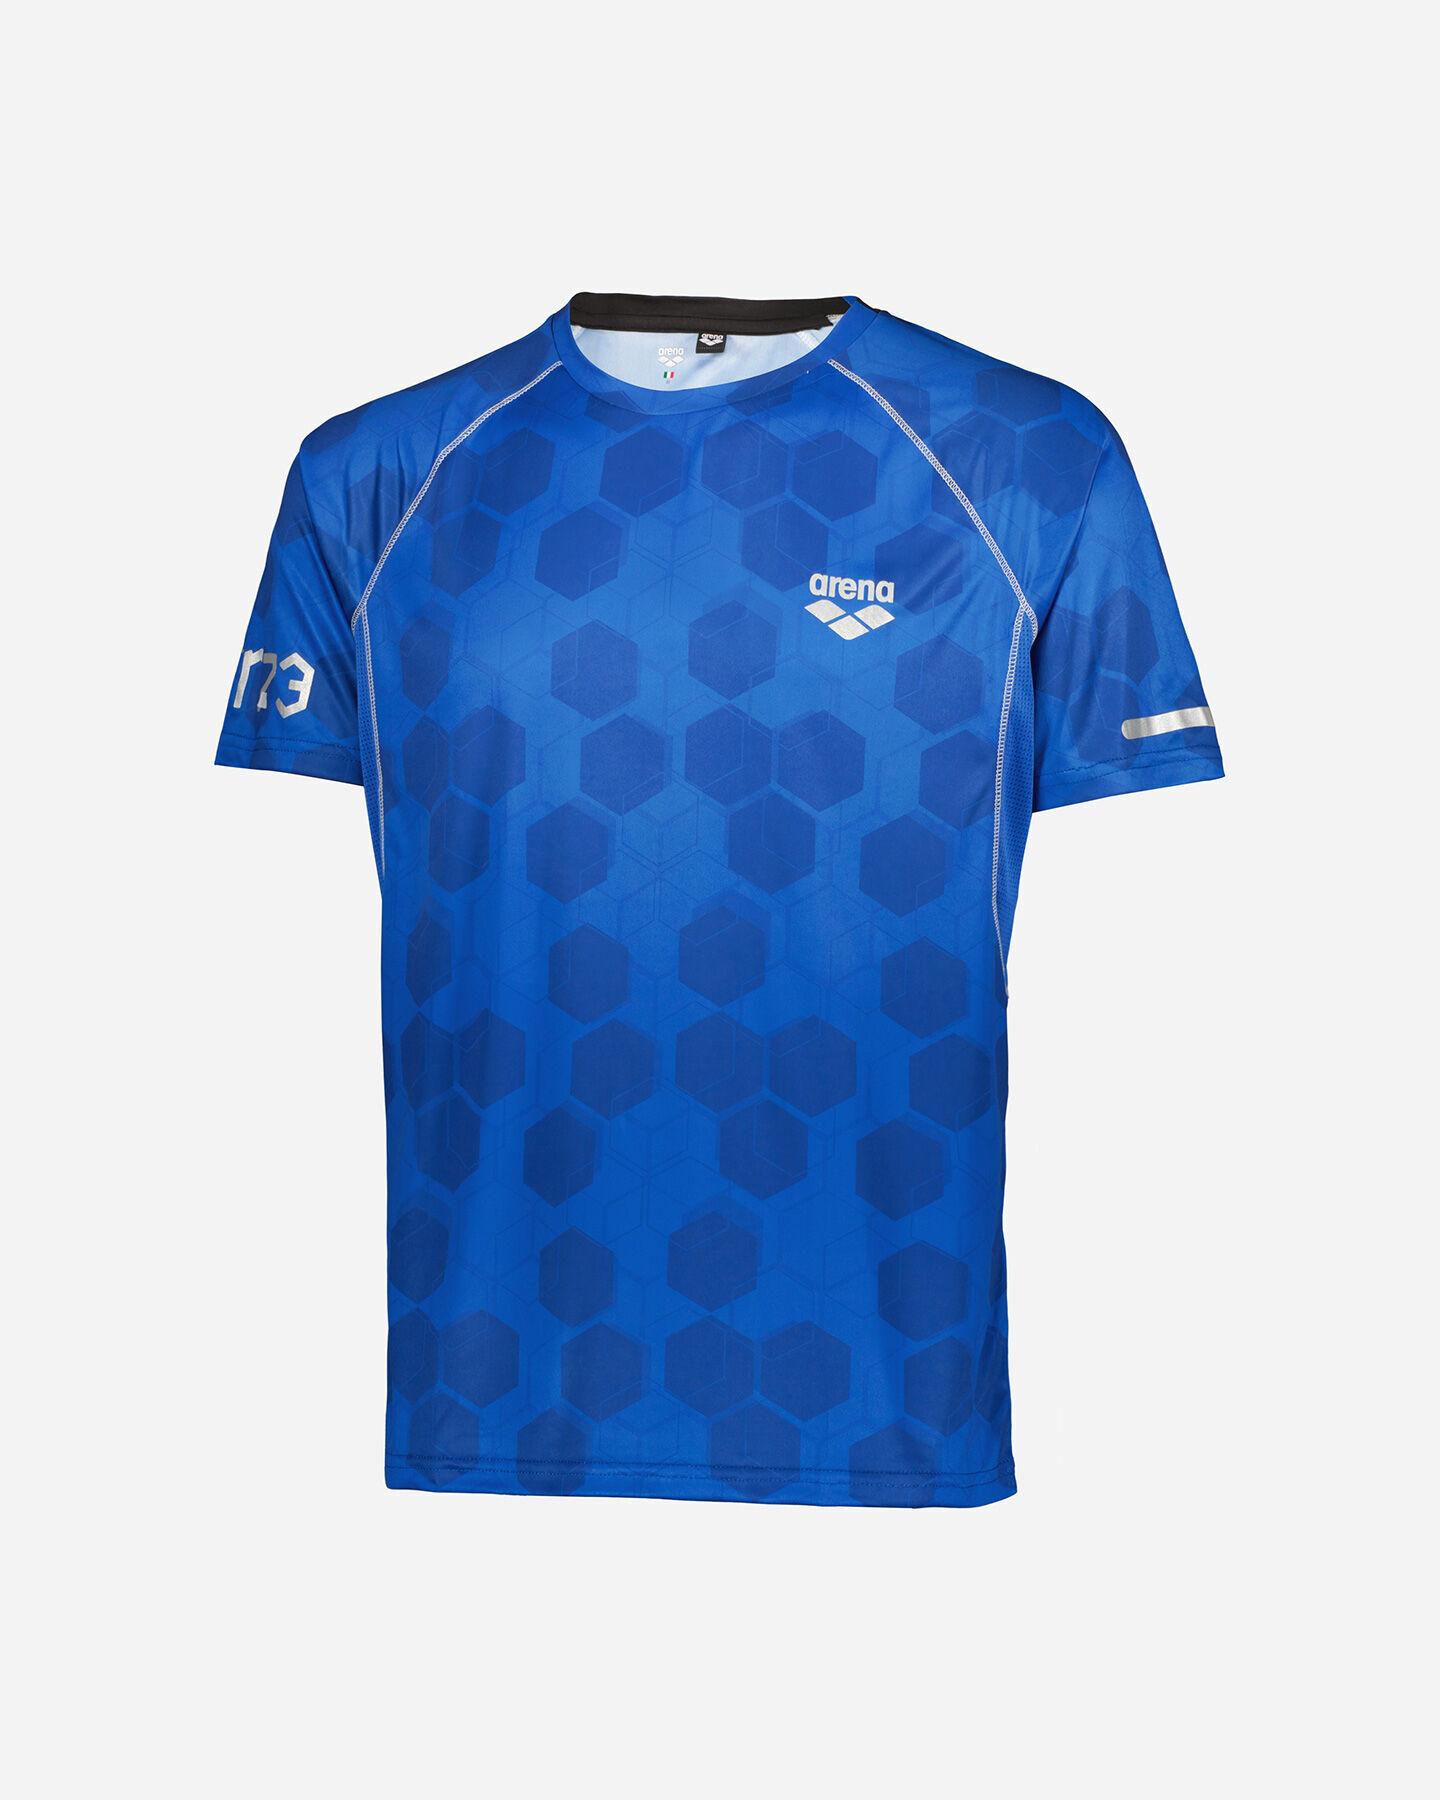 T-Shirt running ARENA ARN 073 M S4093395 scatto 5